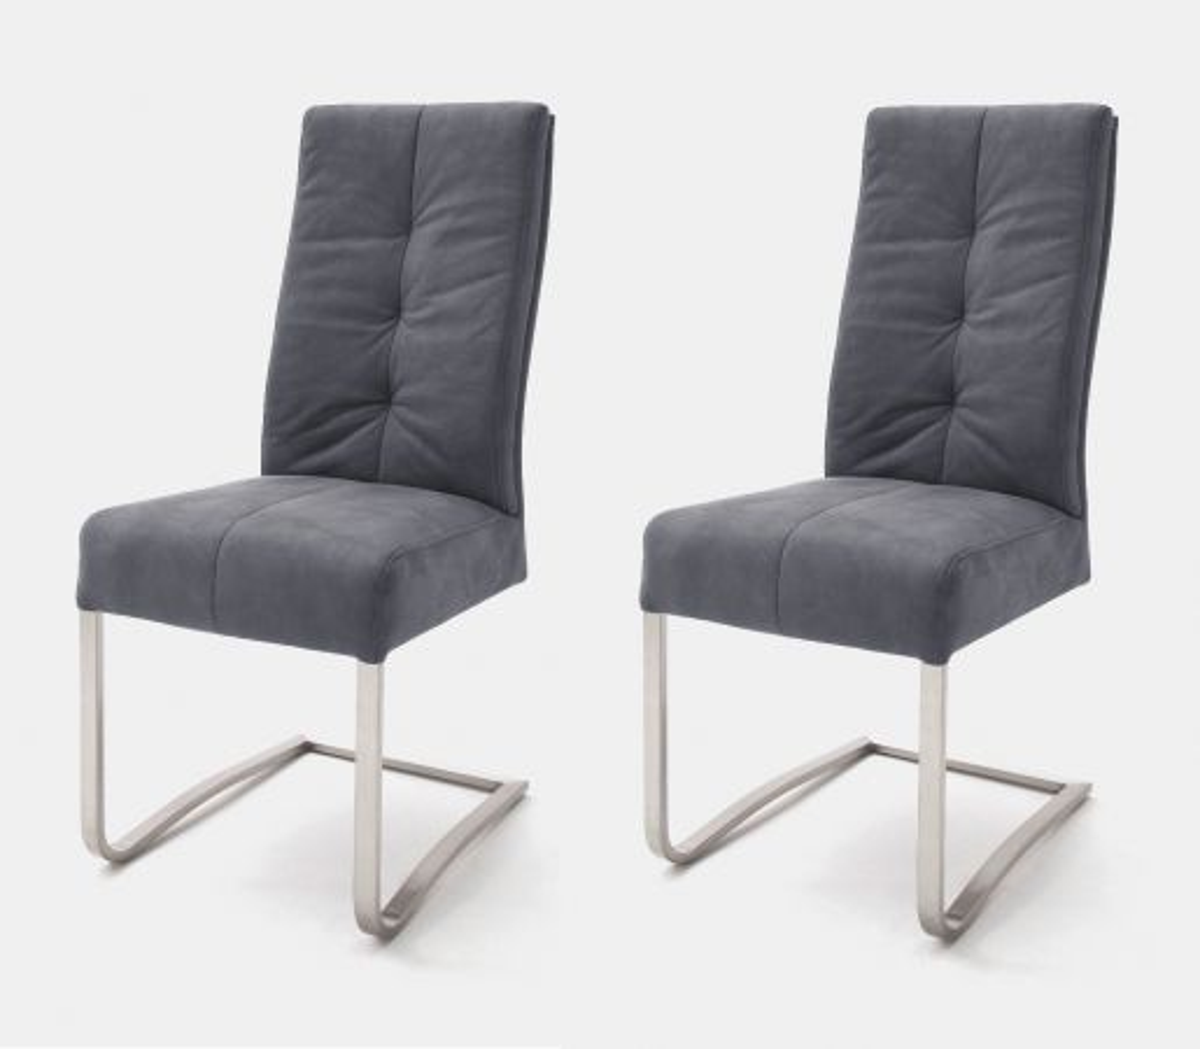 2 x Stuhl Salva Grau Schwinger